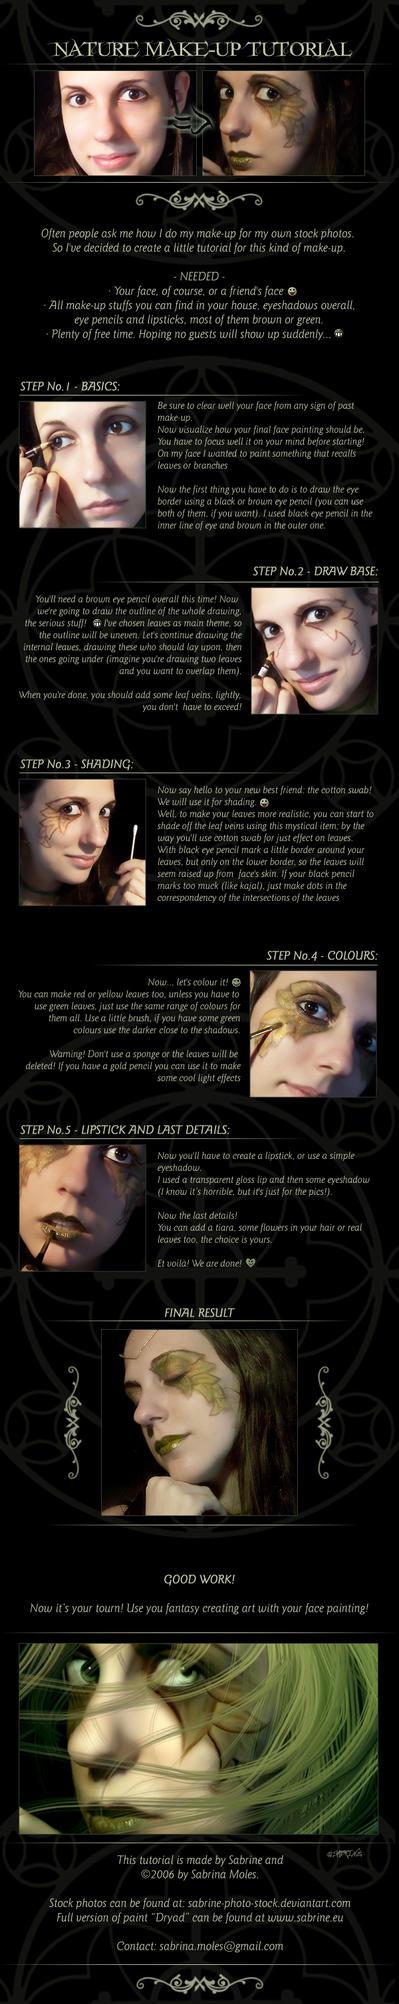 :: Nature Make-Up Tutorial :: by sabrine-photo-stock